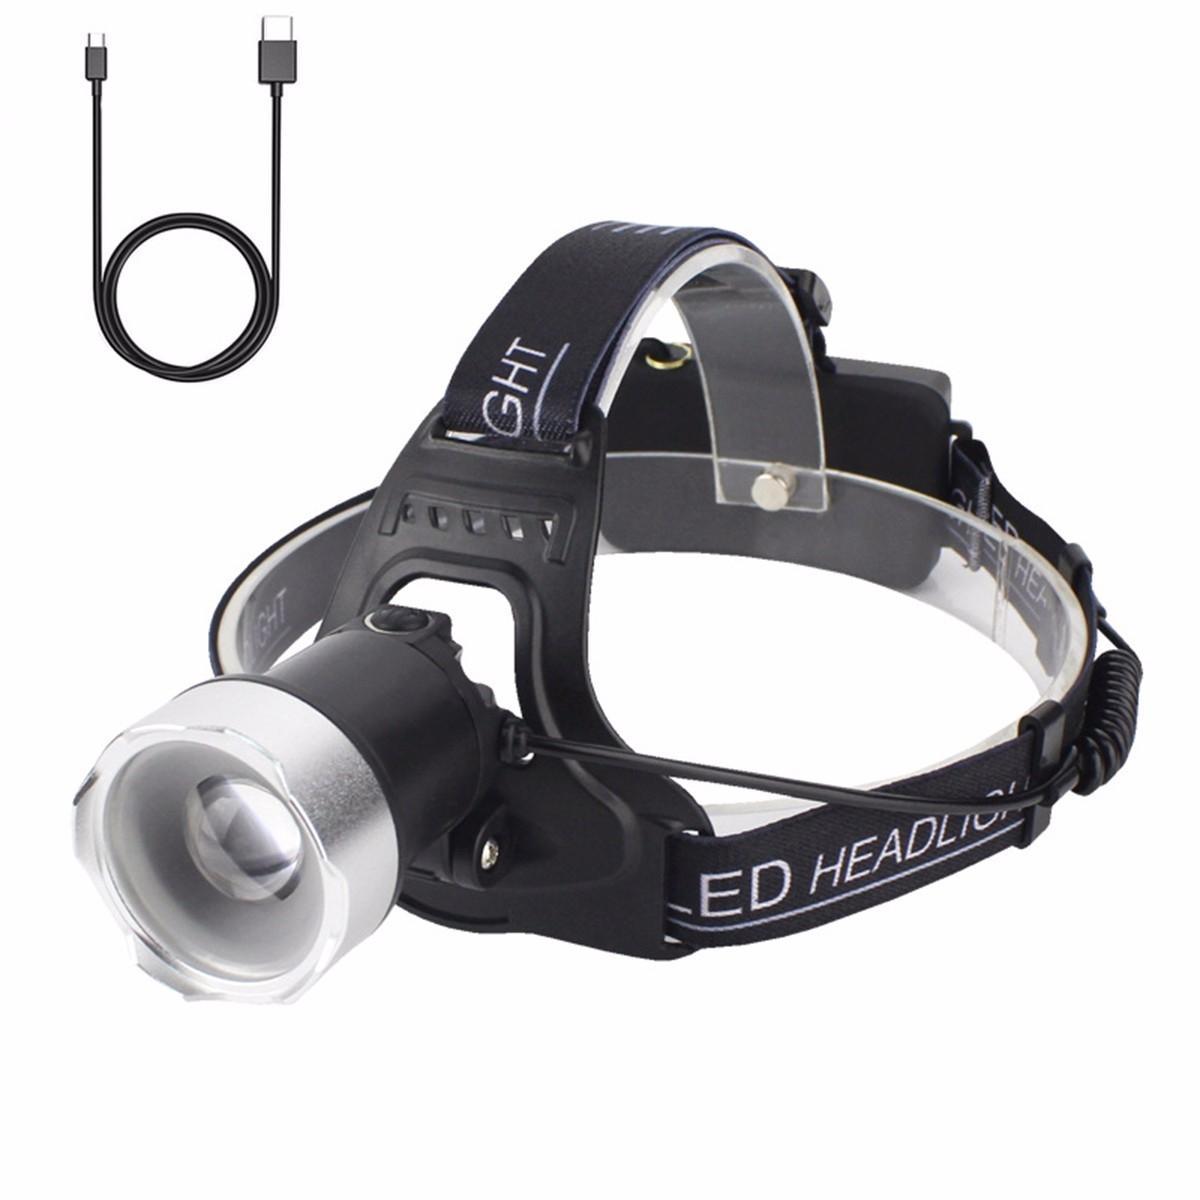 Portable Lighting Flashlights & Torches Black Plastic White Light Press Button Usb Led Lamp Torch